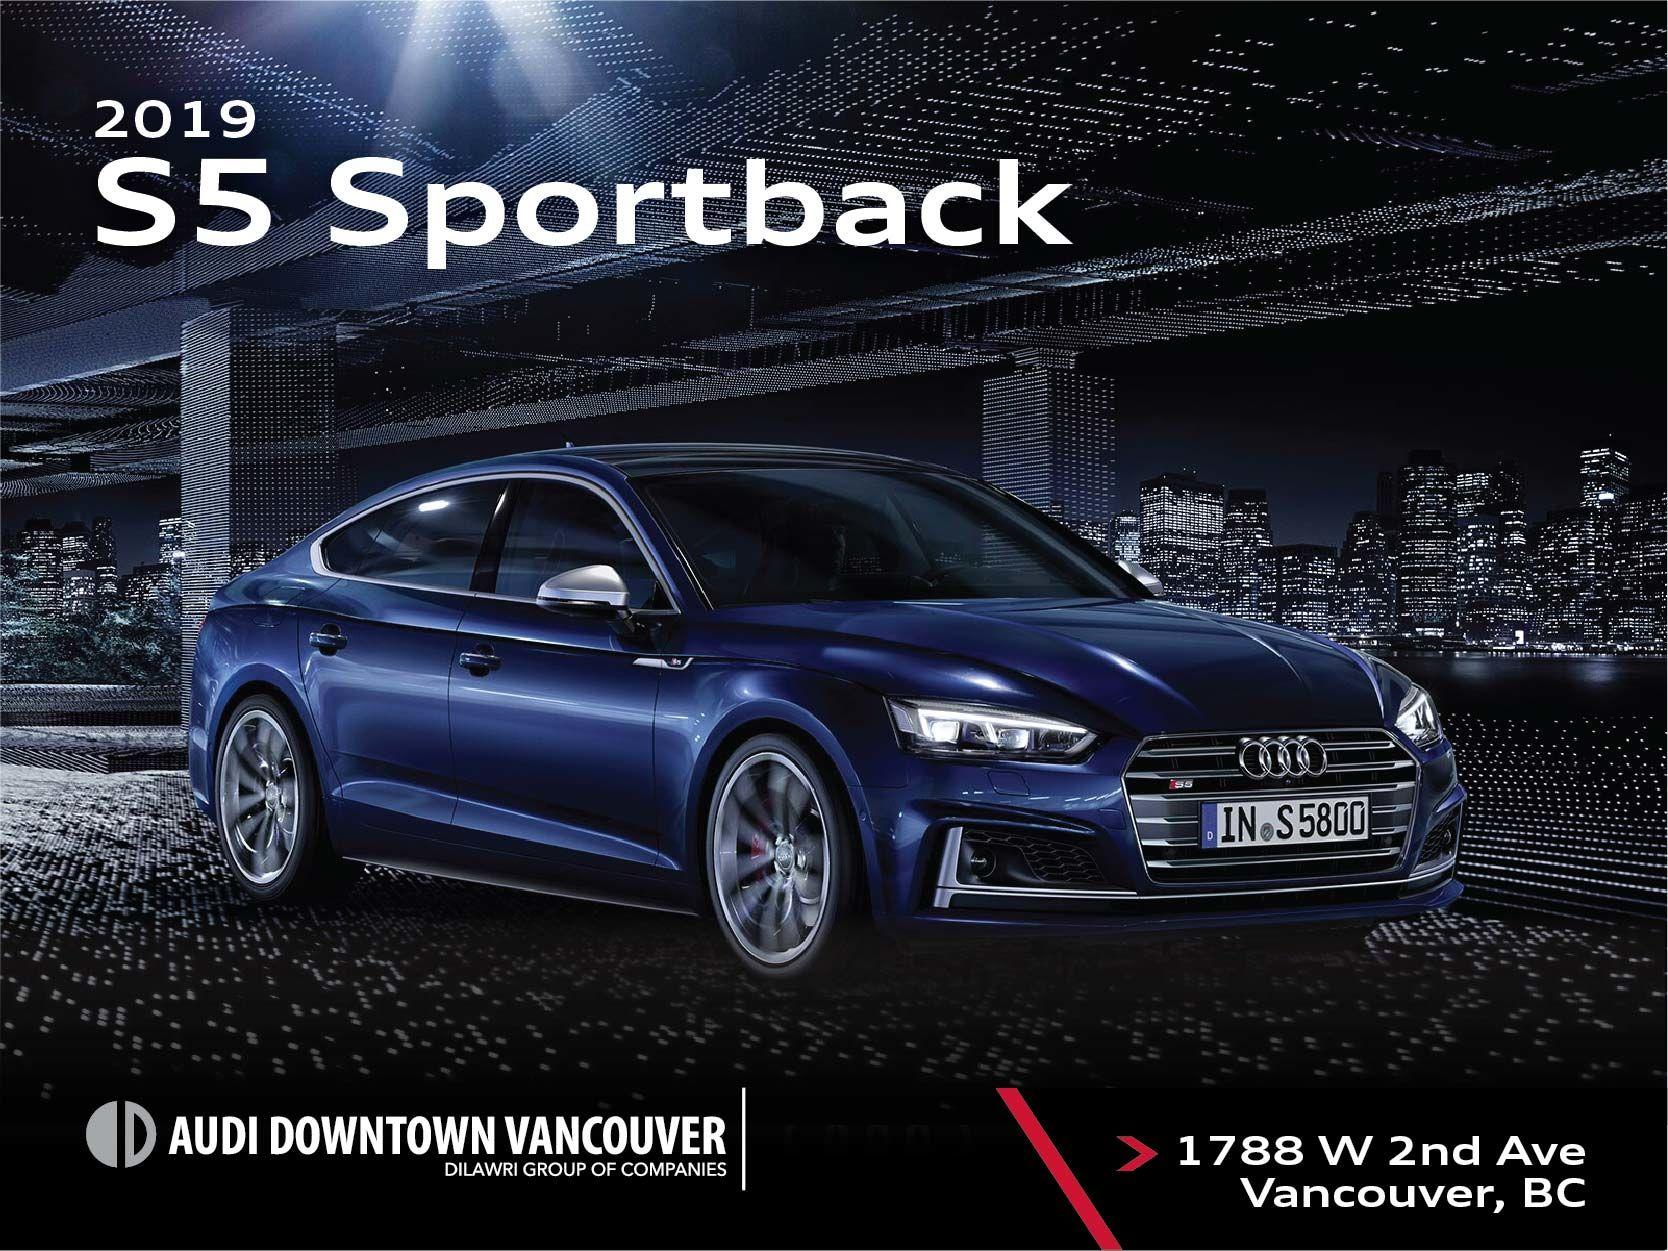 The 2019 Audi S5 Sportback